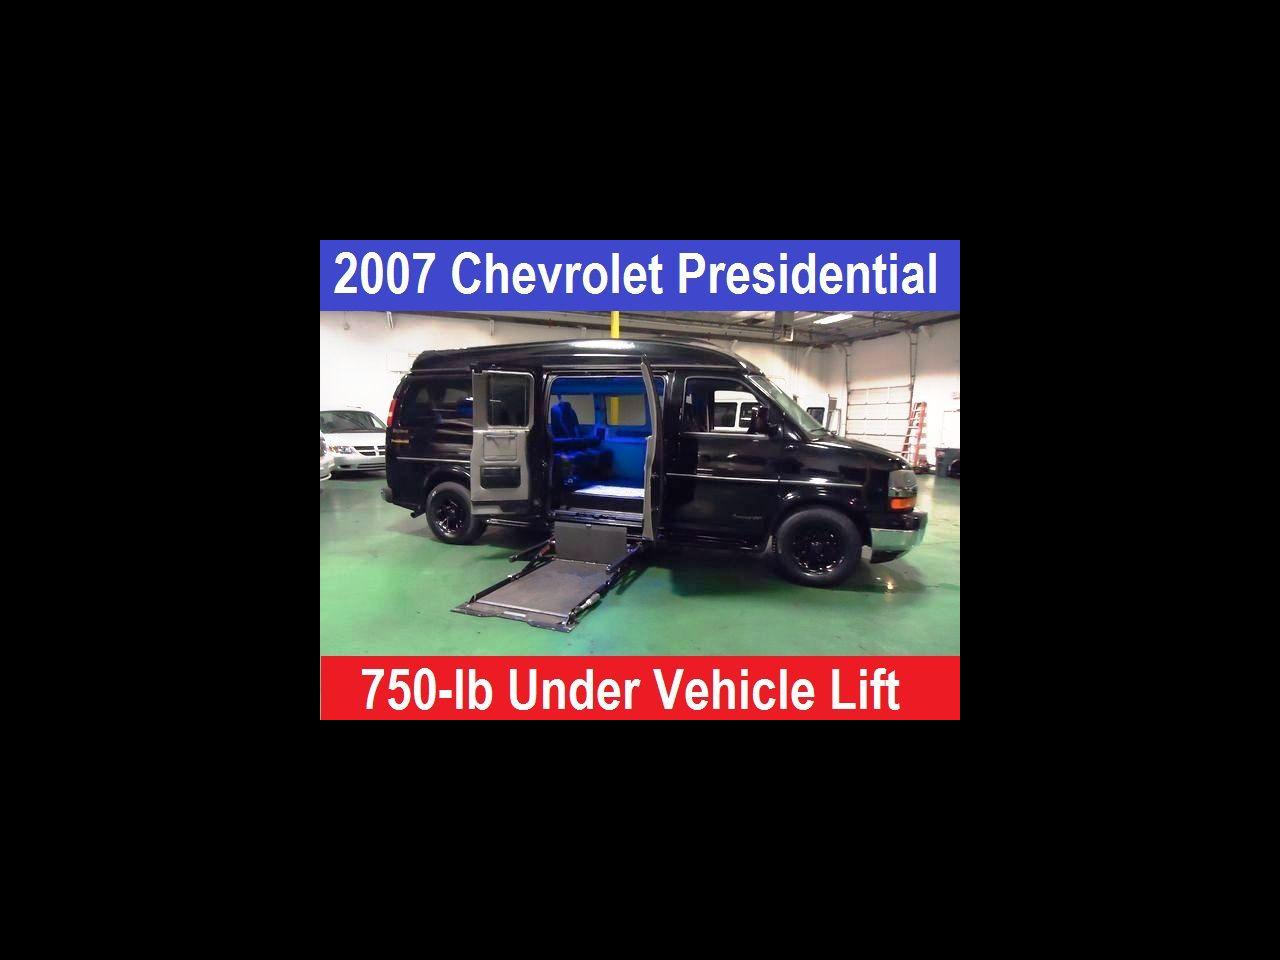 2007 Chevrolet 2500 Presidential Wheelchair Hadicap Mobility UVL Conve